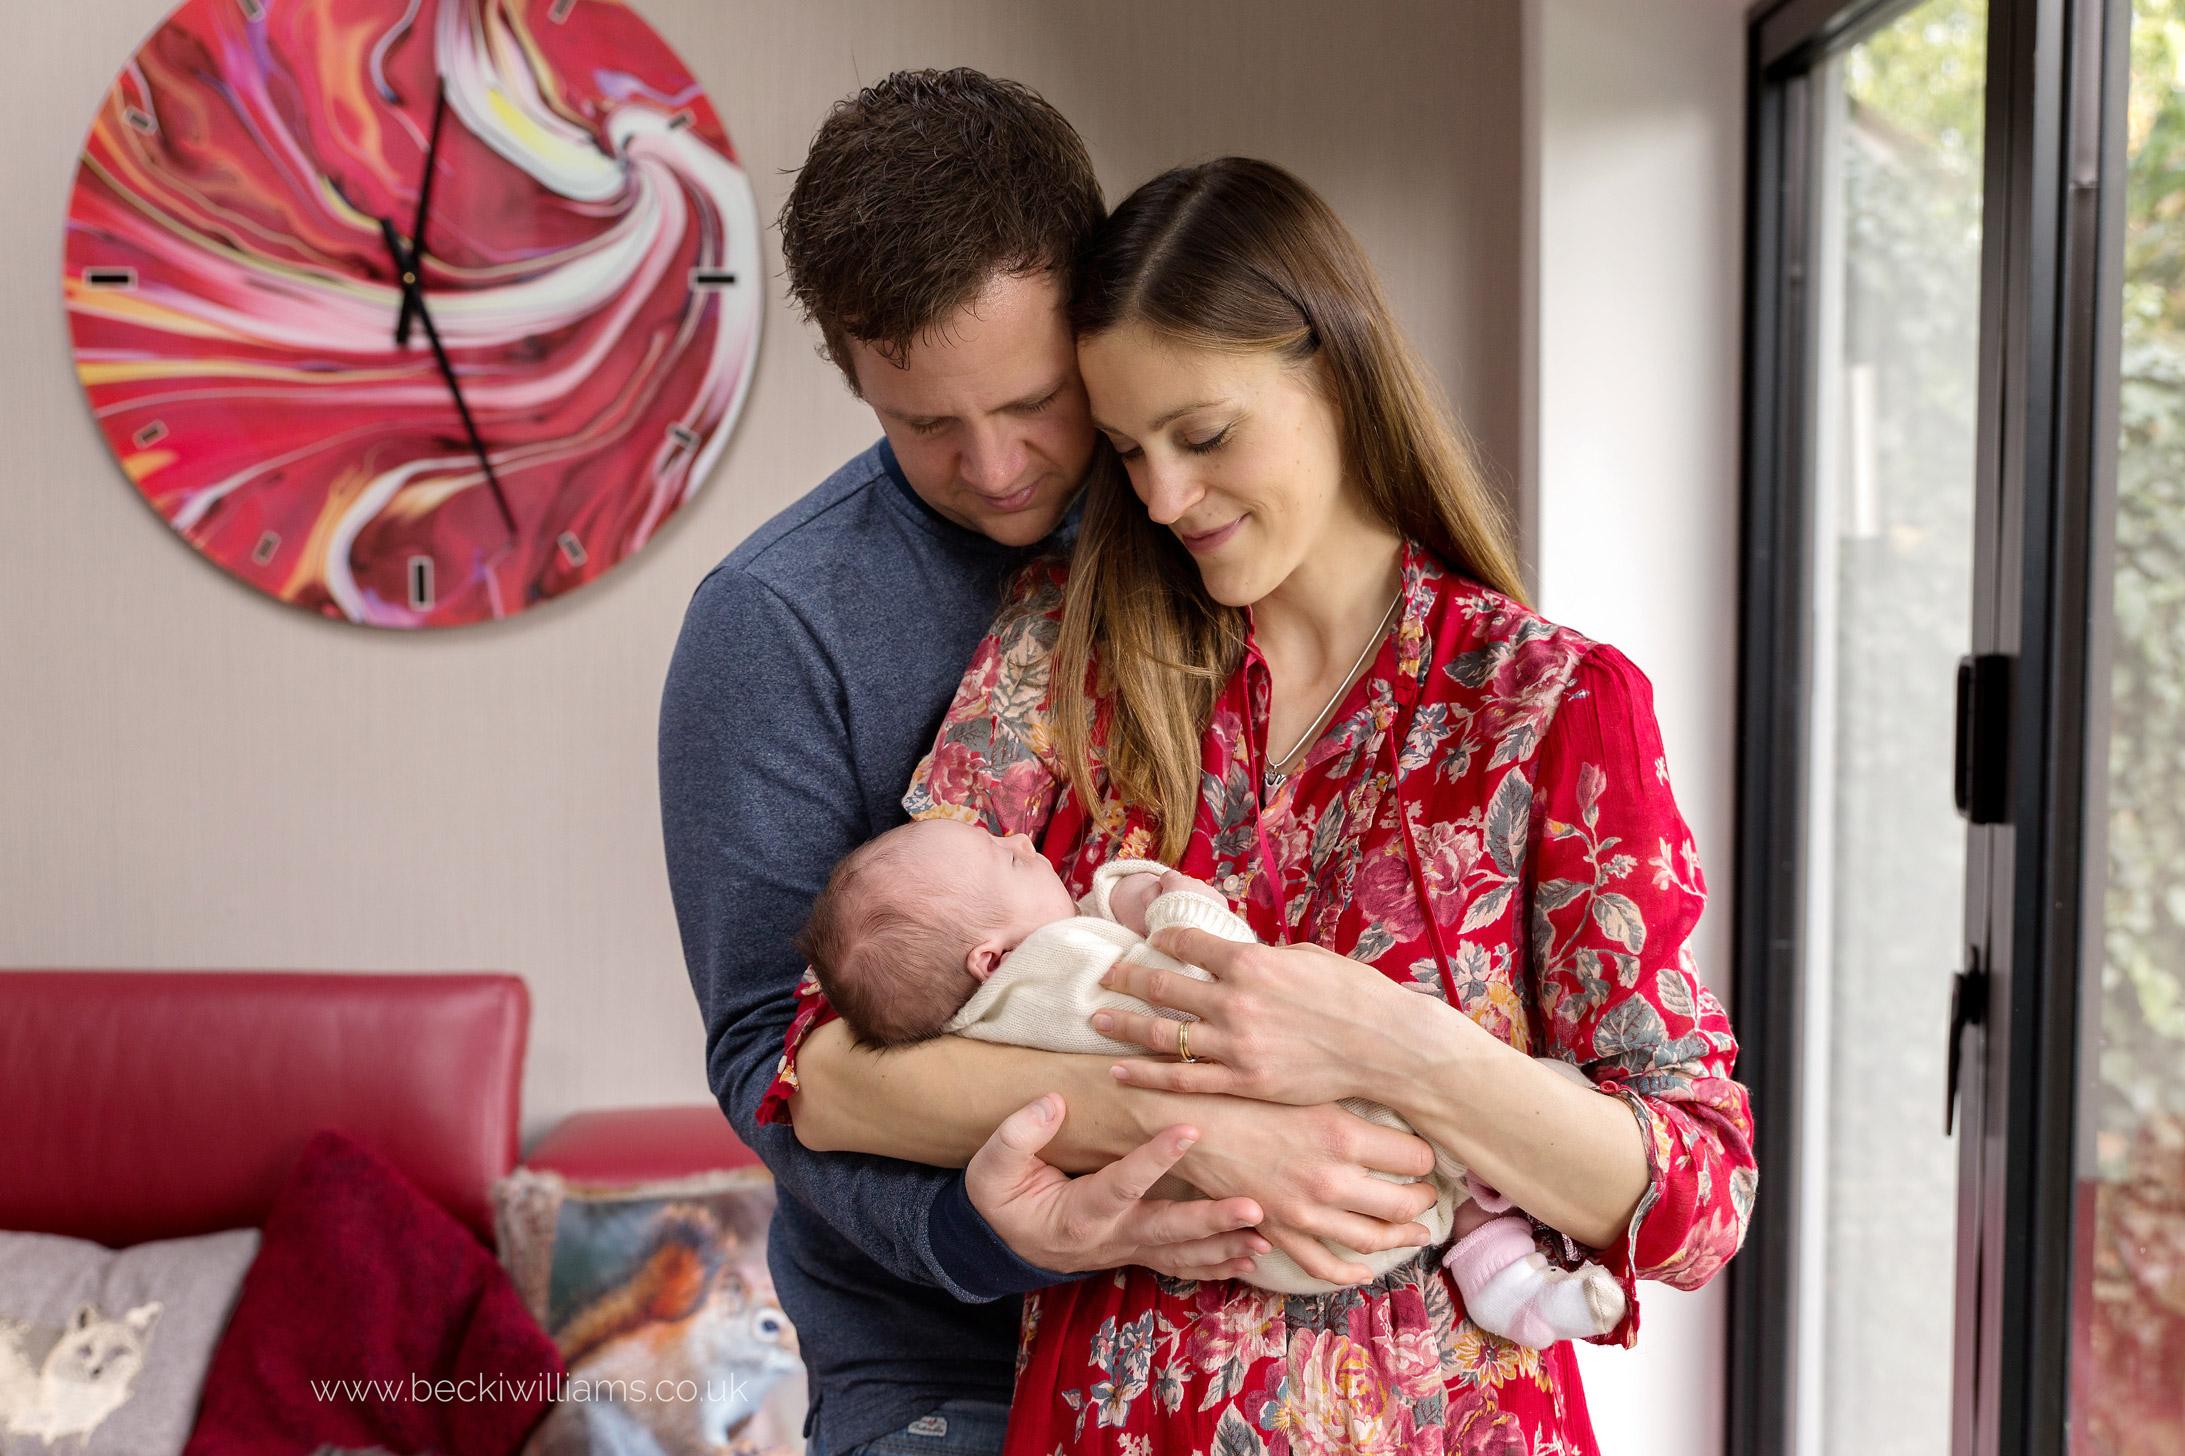 new parents holding their newborn baby, staring at her lovingly in redbourn, hertfordshire